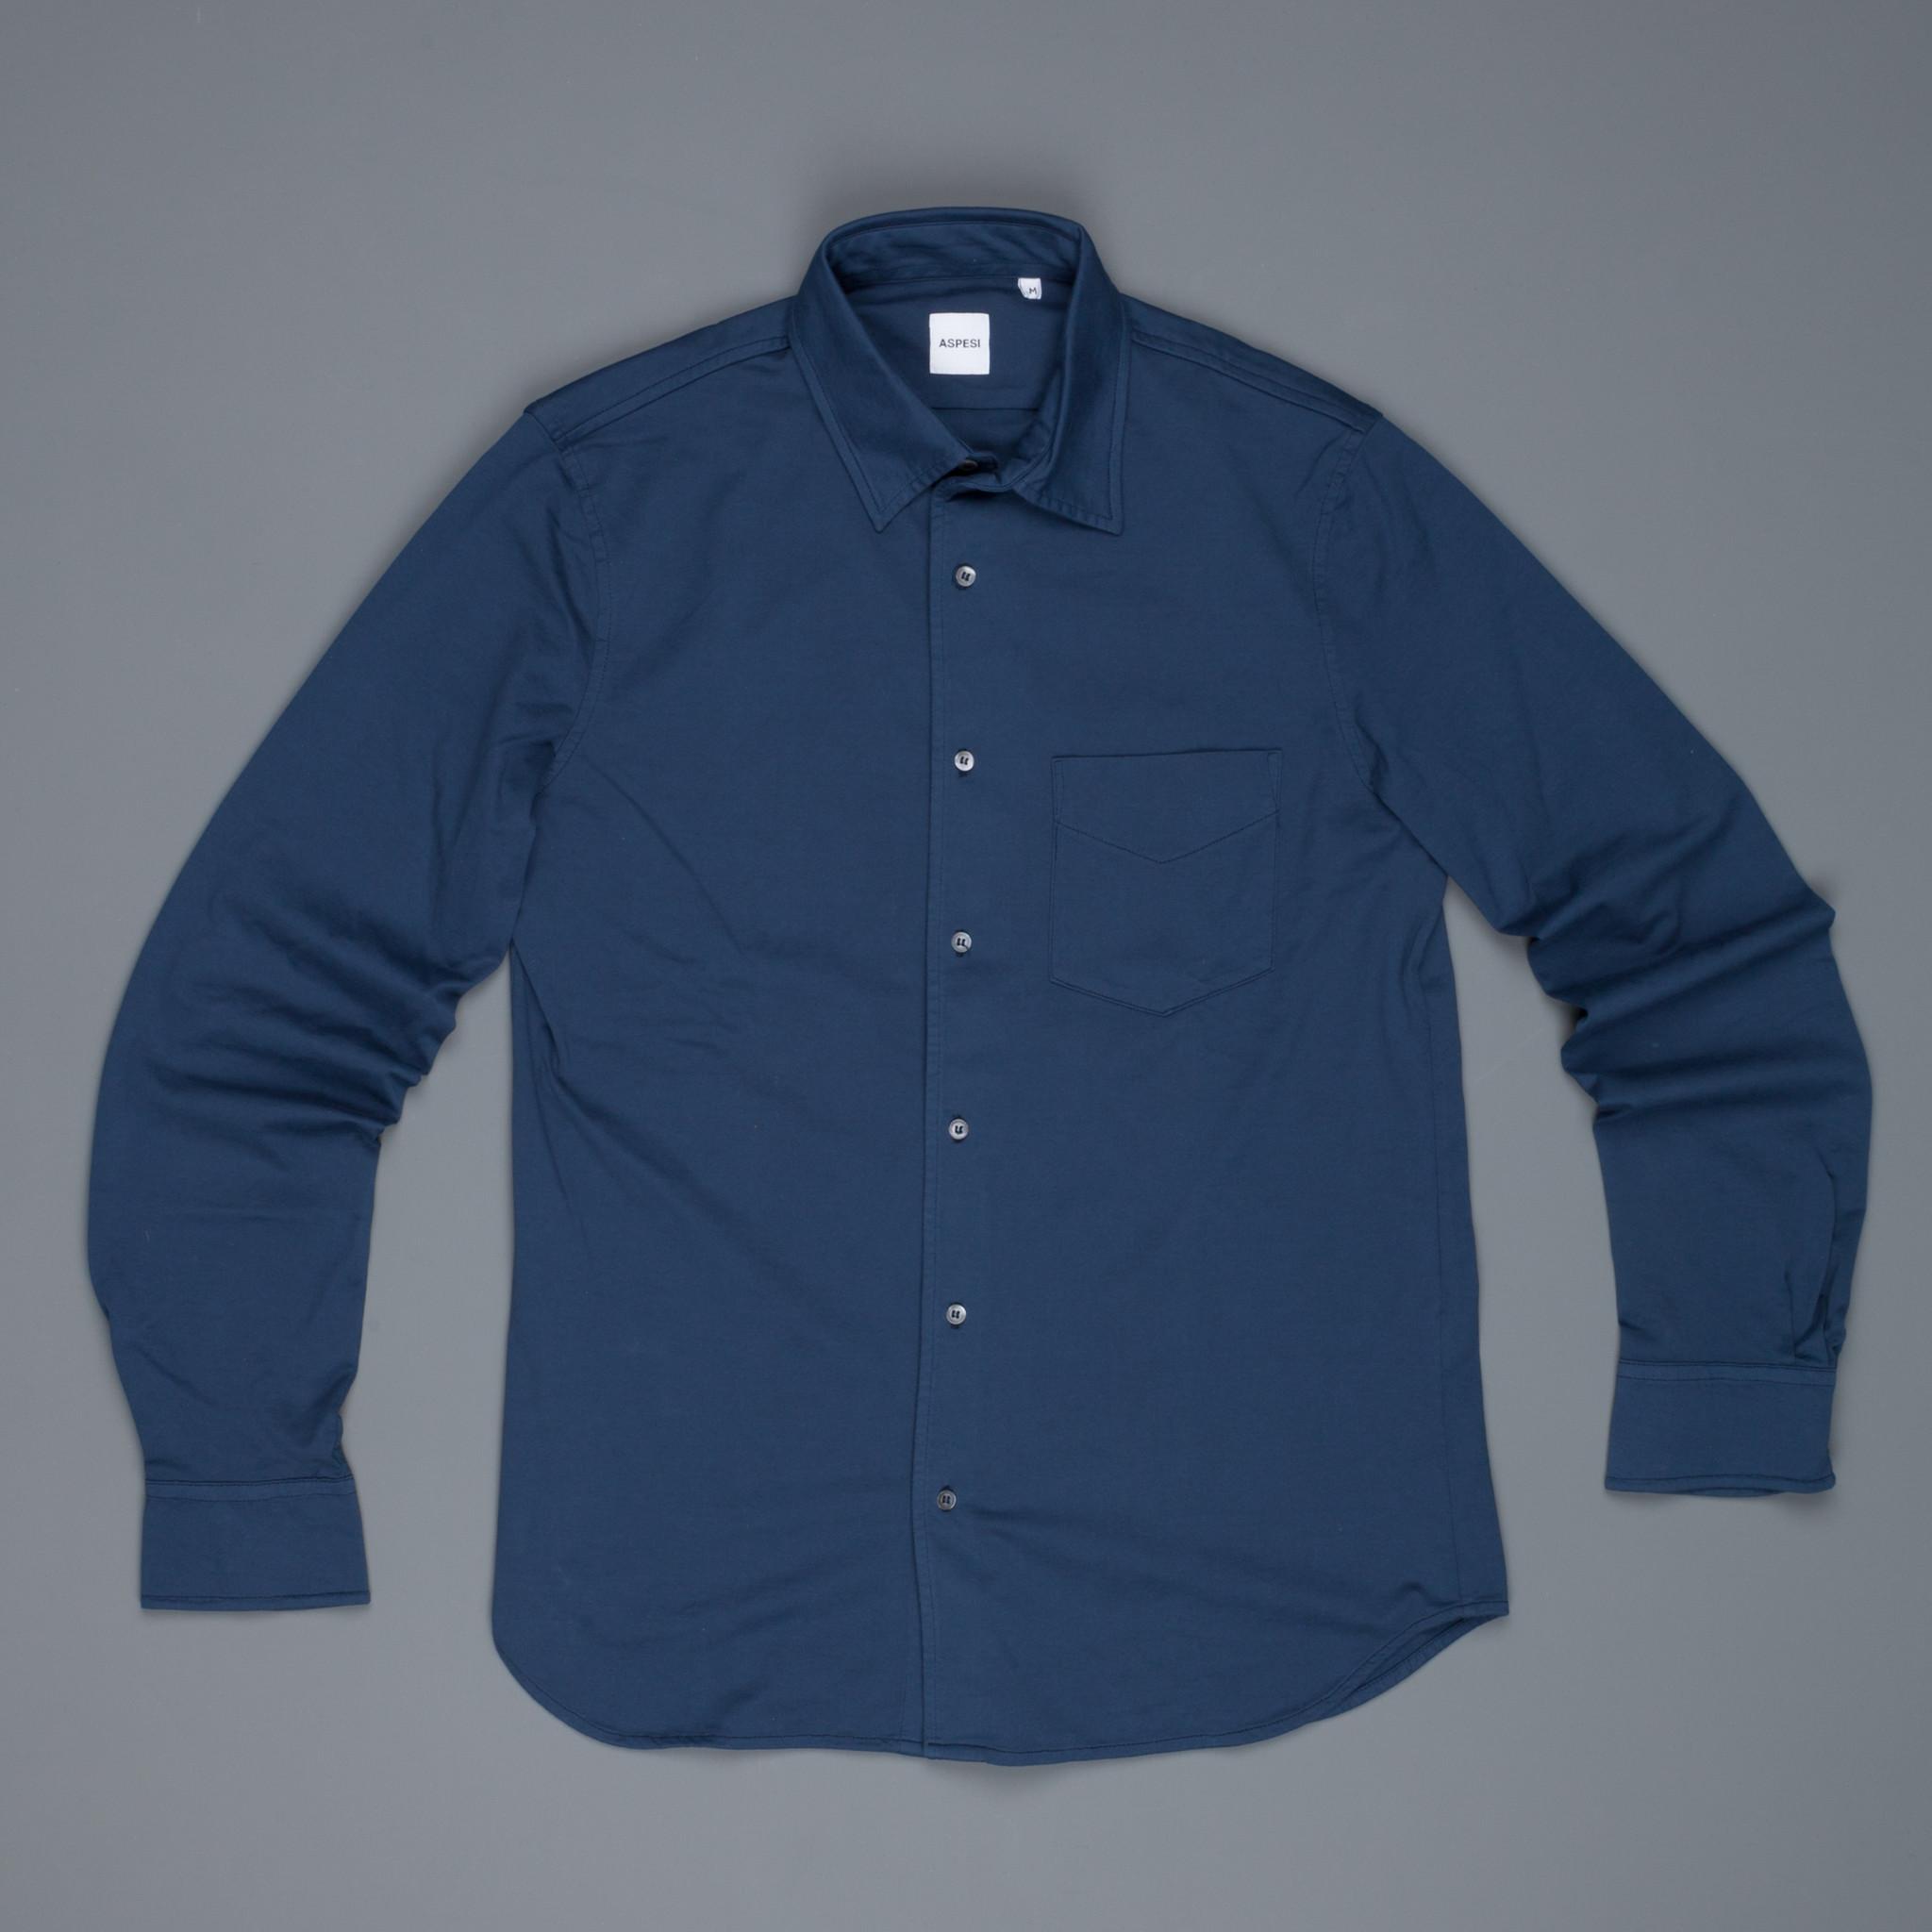 Aspesi chemise jersey 4.jpg